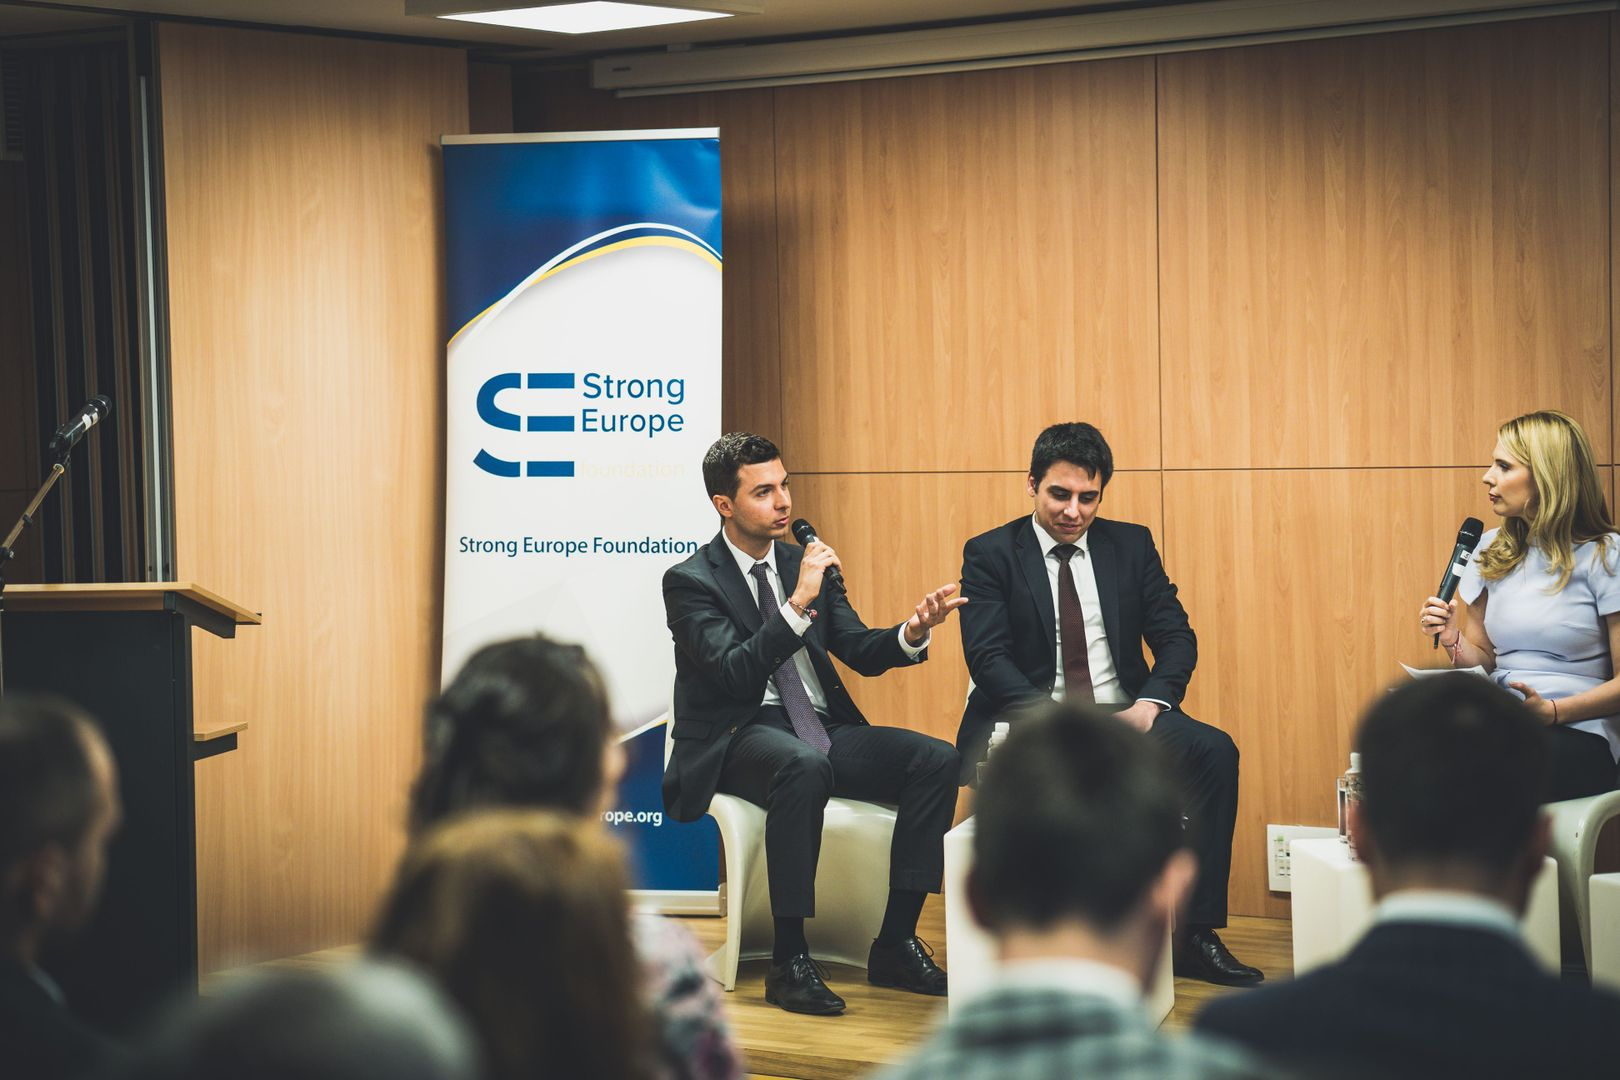 conservative-millenium-strongeurope-event-april-44